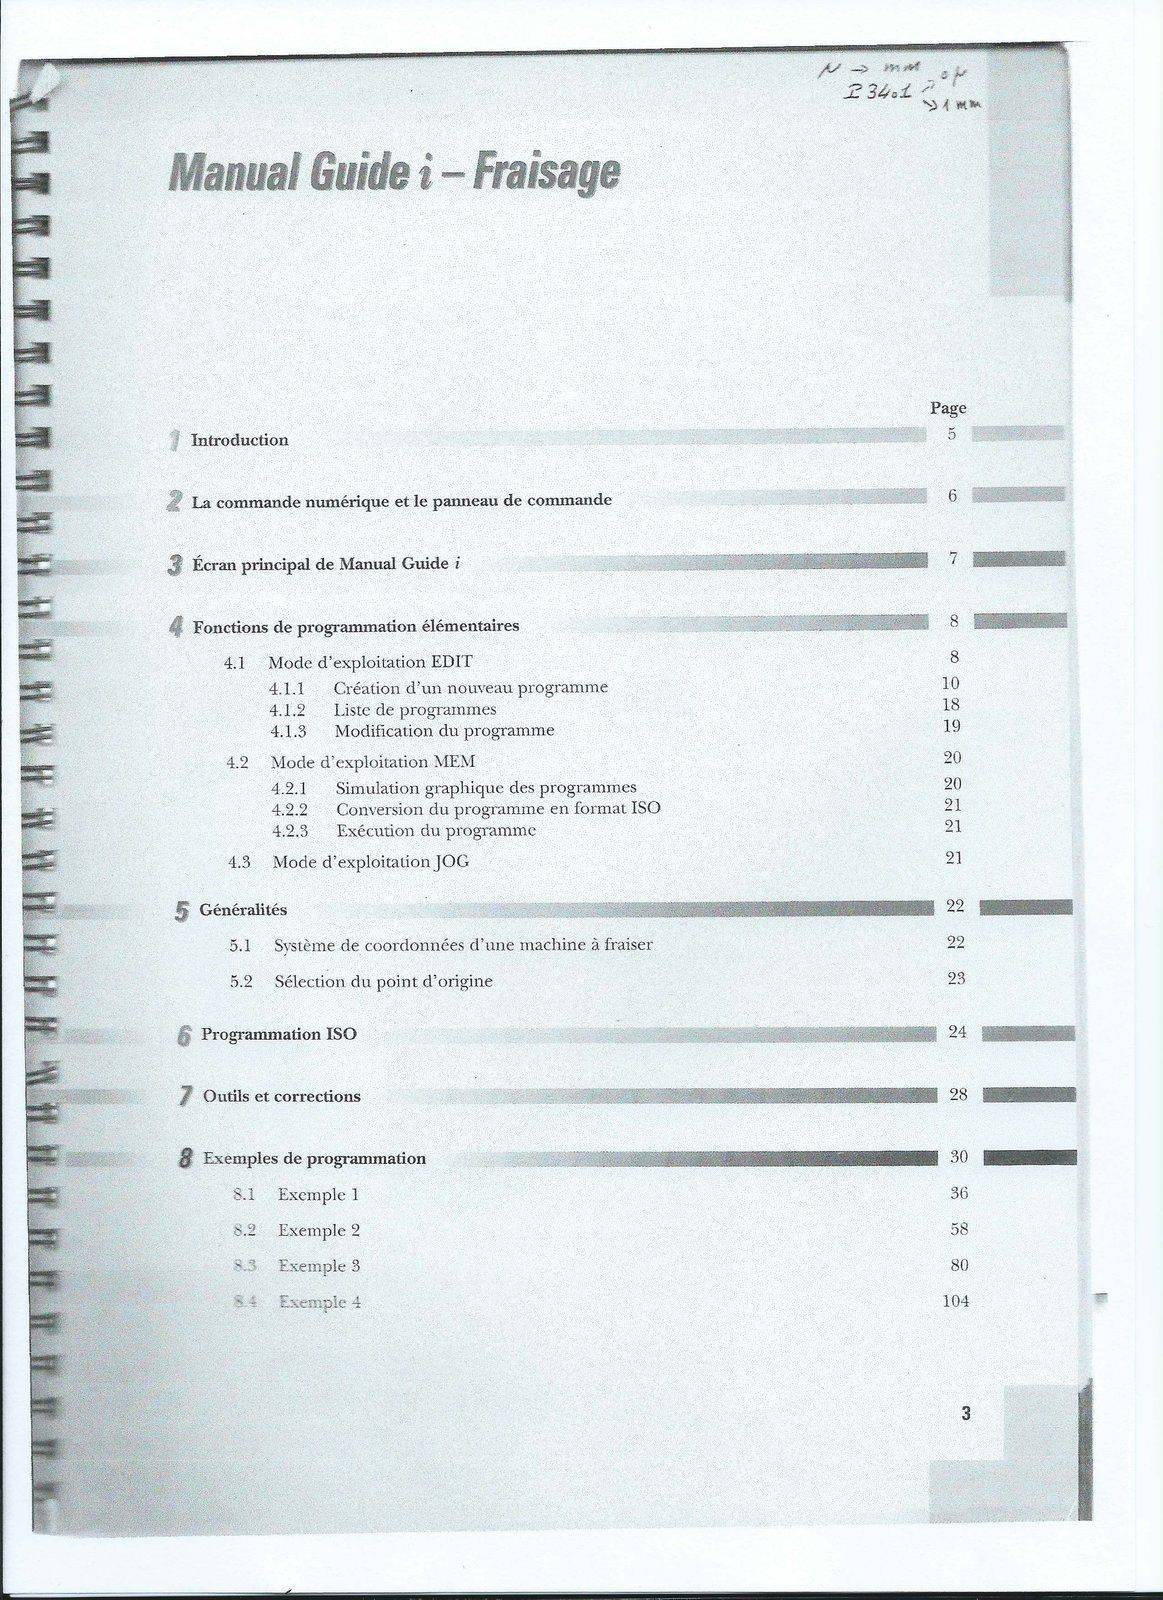 manuel guide 1.jpg